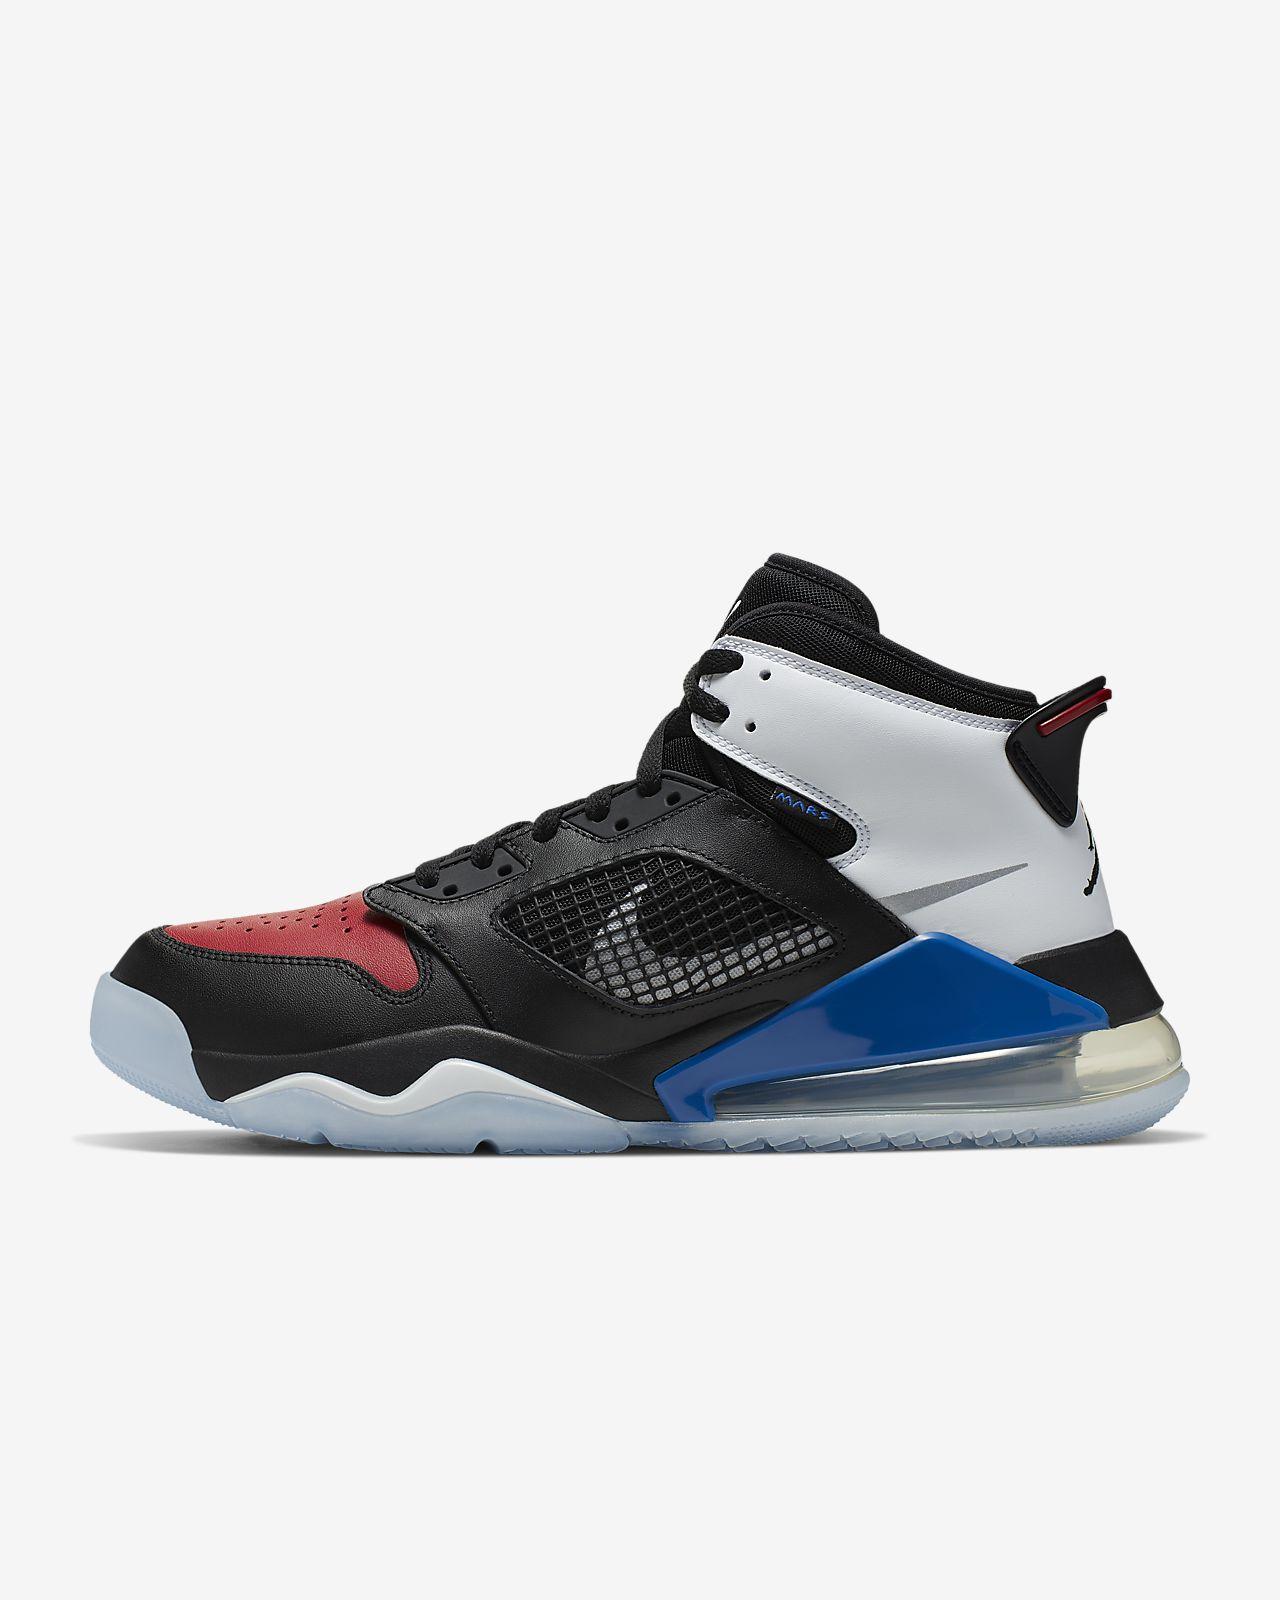 Jordan Mars 270 Men's Shoe